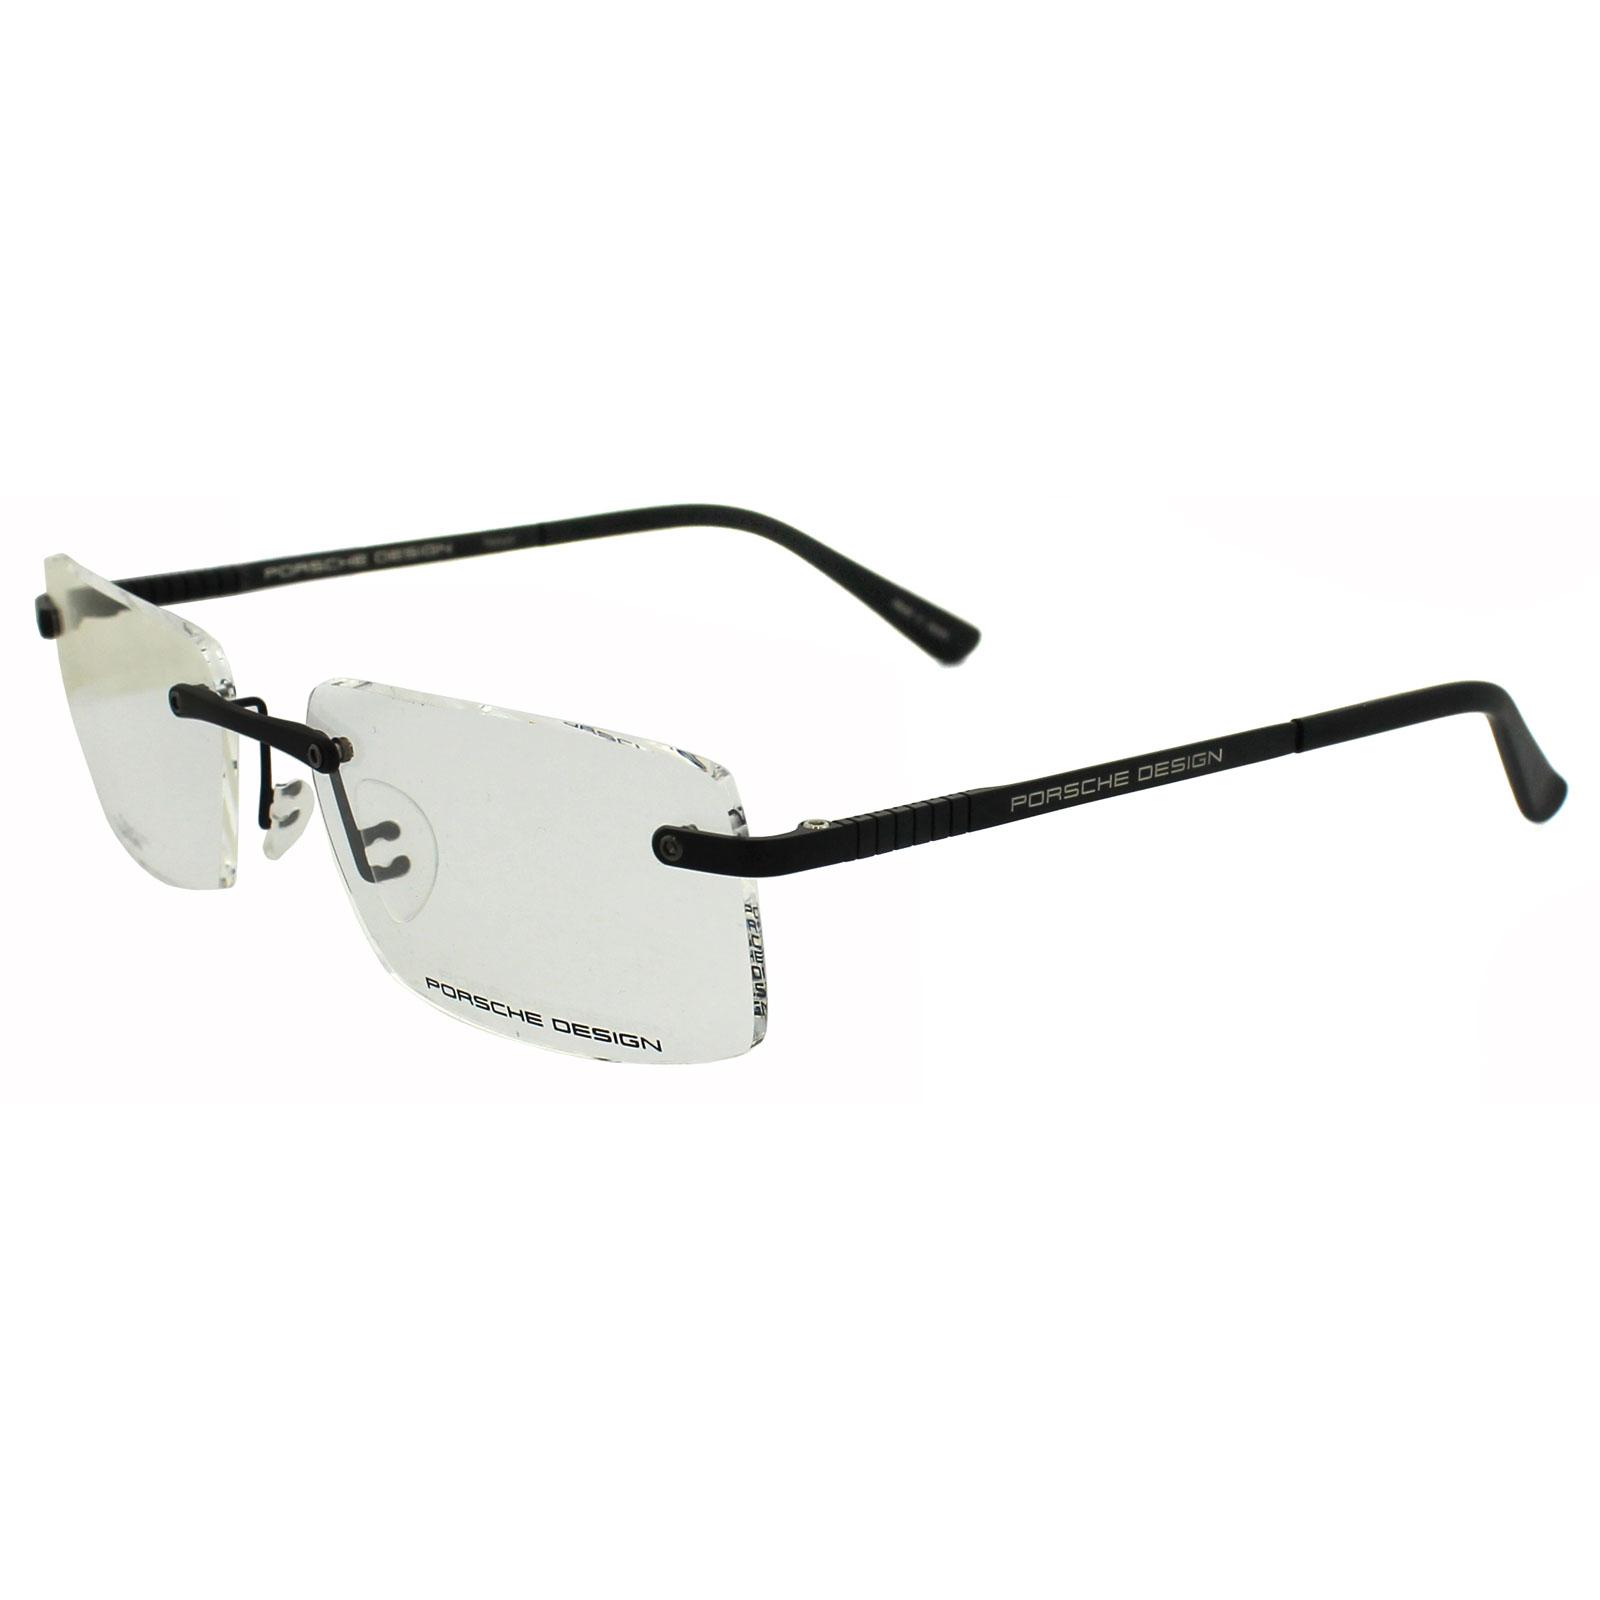 cheap porsche design p8238 glasses frames discounted